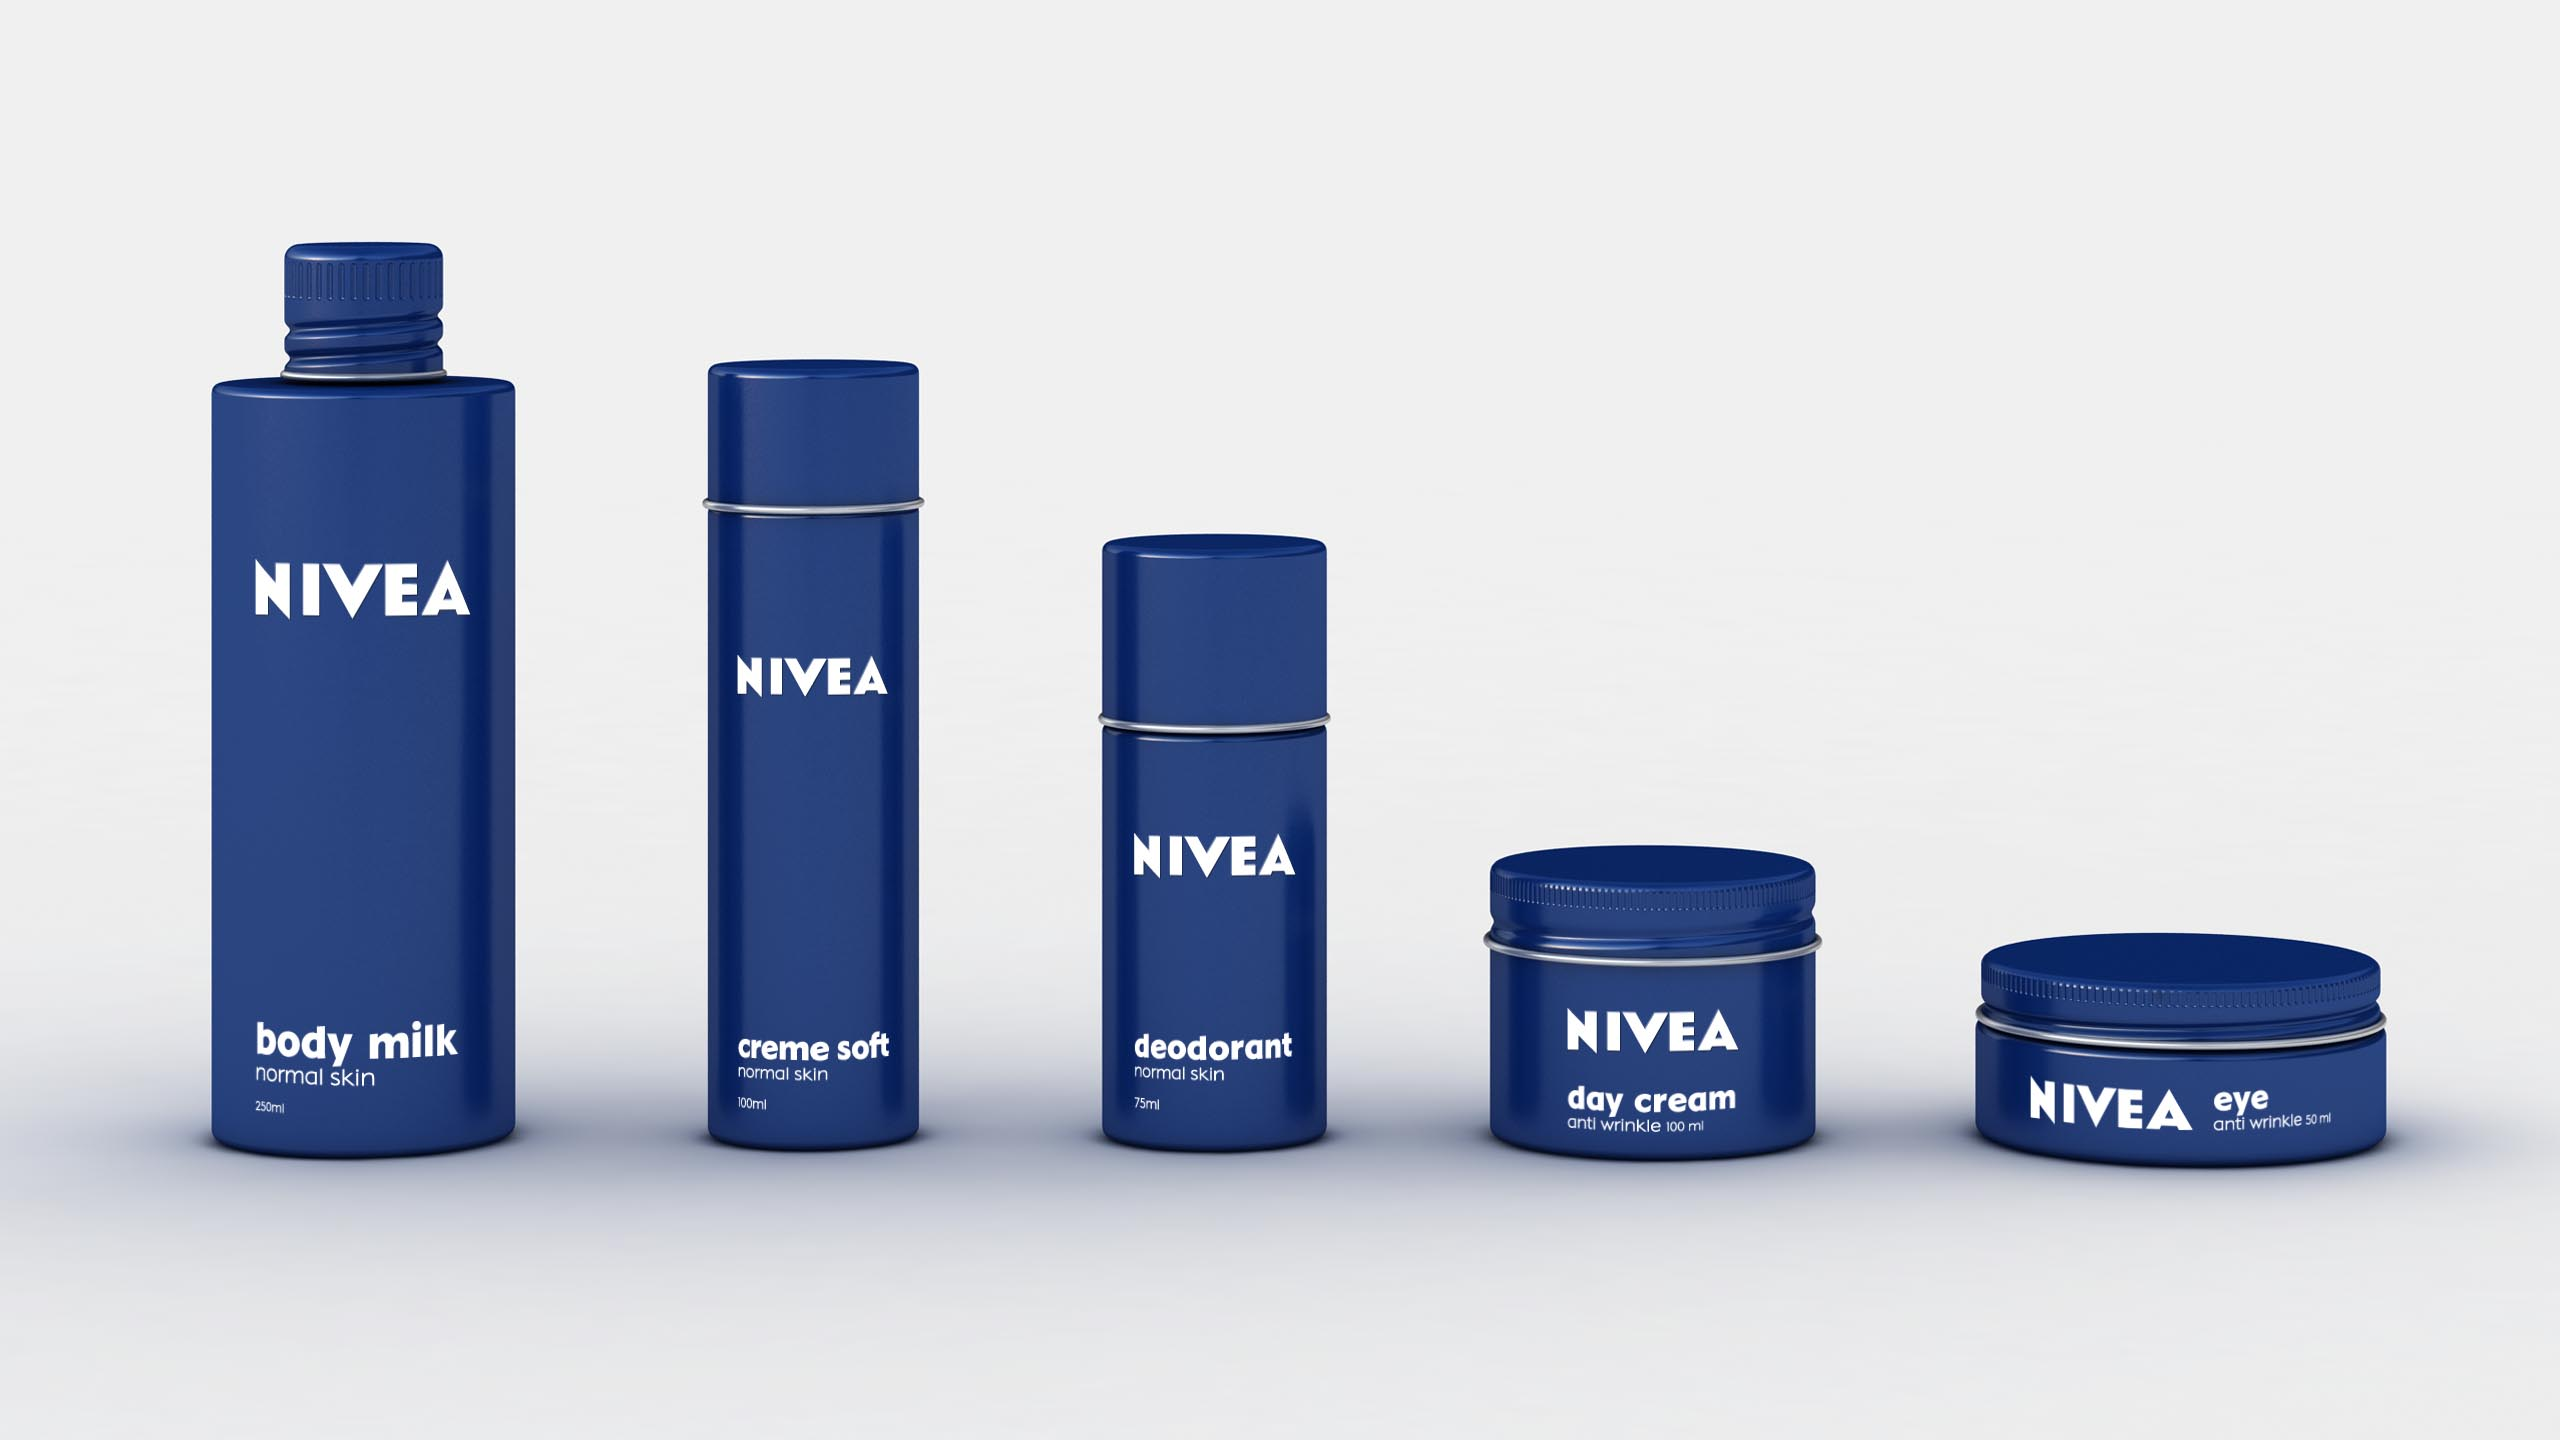 re-branding Nivea product architecture